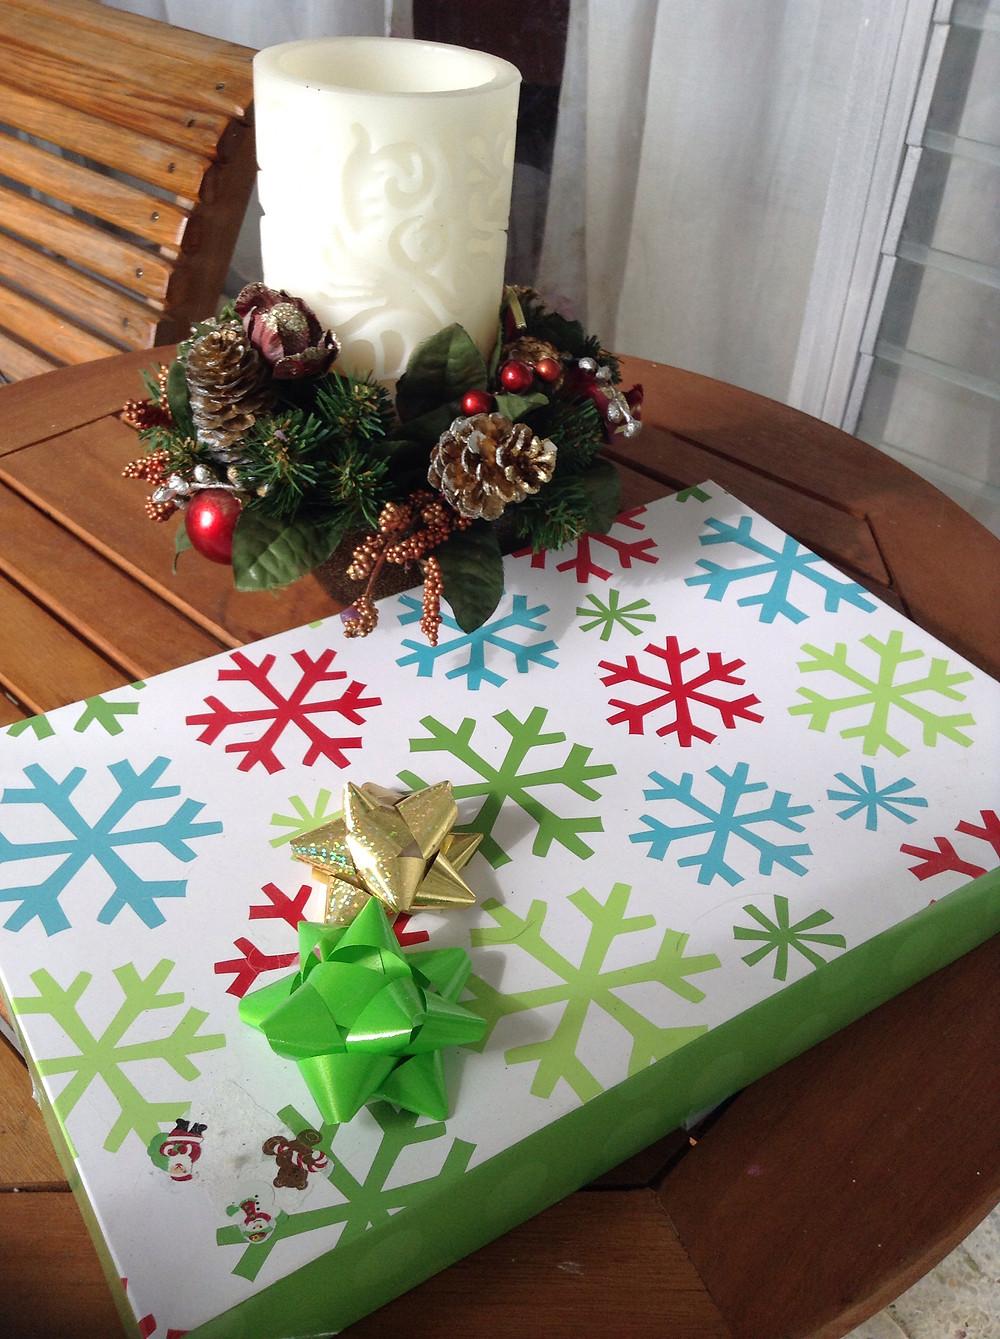 An Early Christmas Gift!